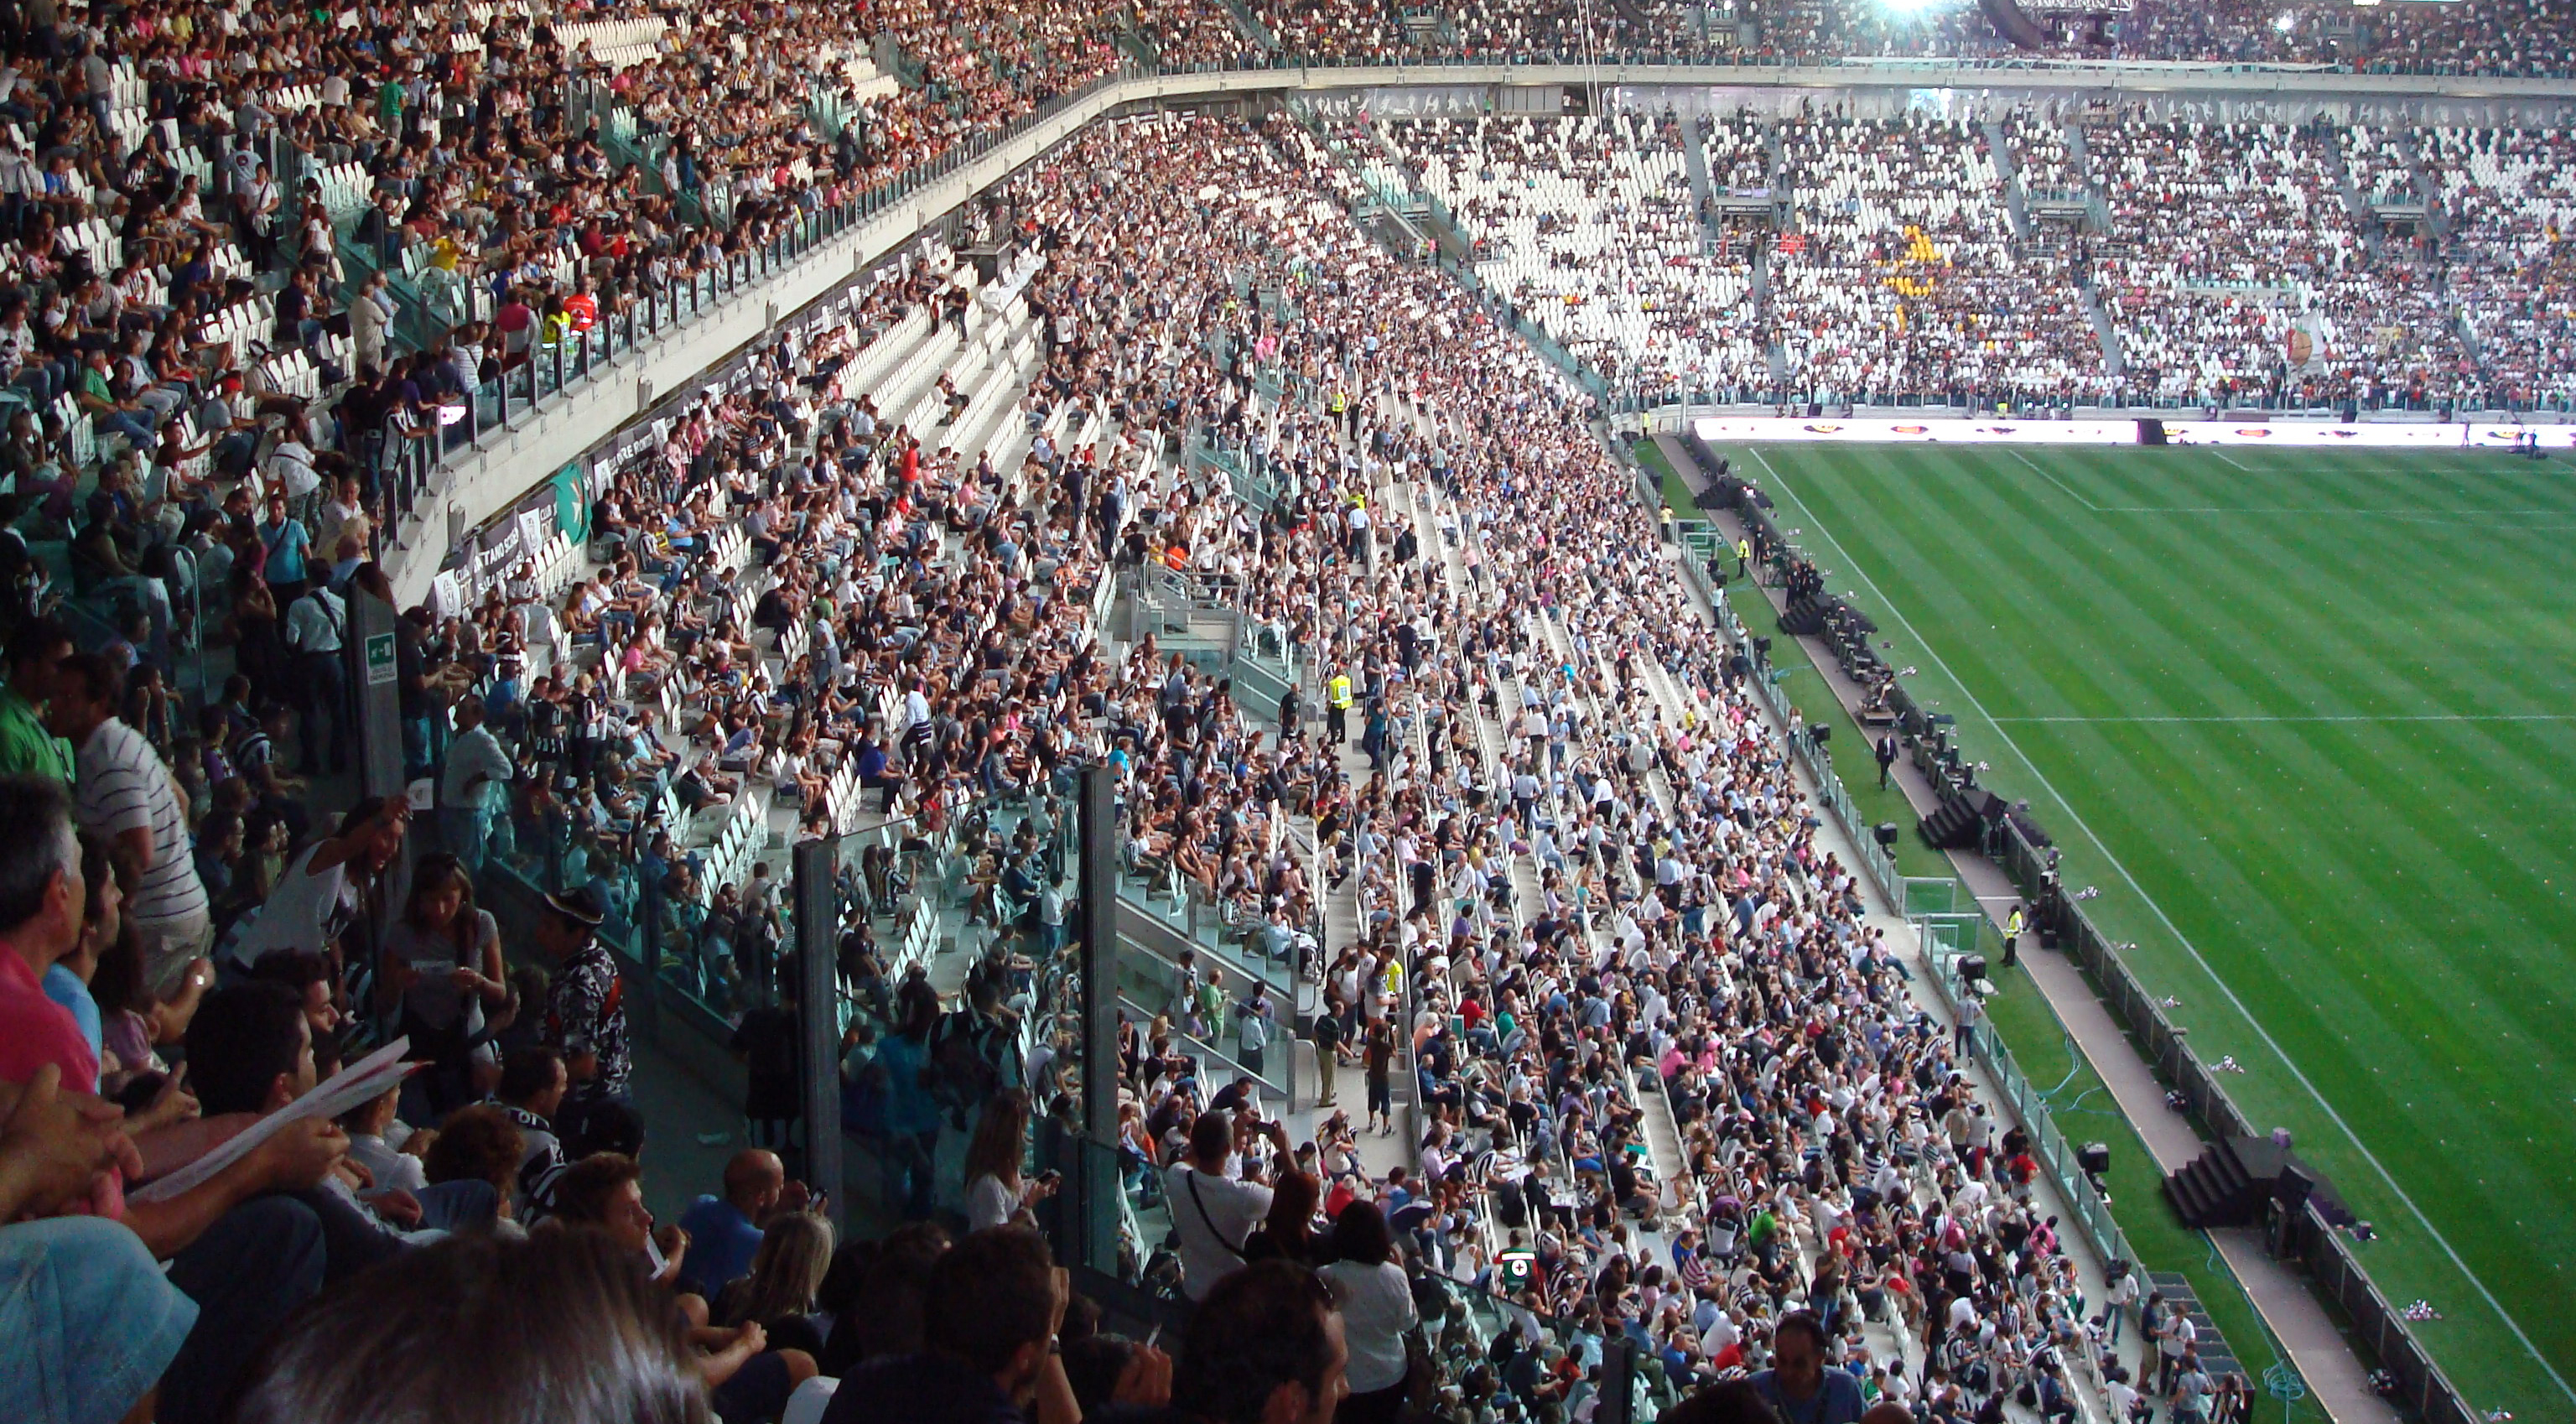 Berkas Juventus Stadium Tribuna Est Jpg Wikipedia Bahasa Indonesia Ensiklopedia Bebas